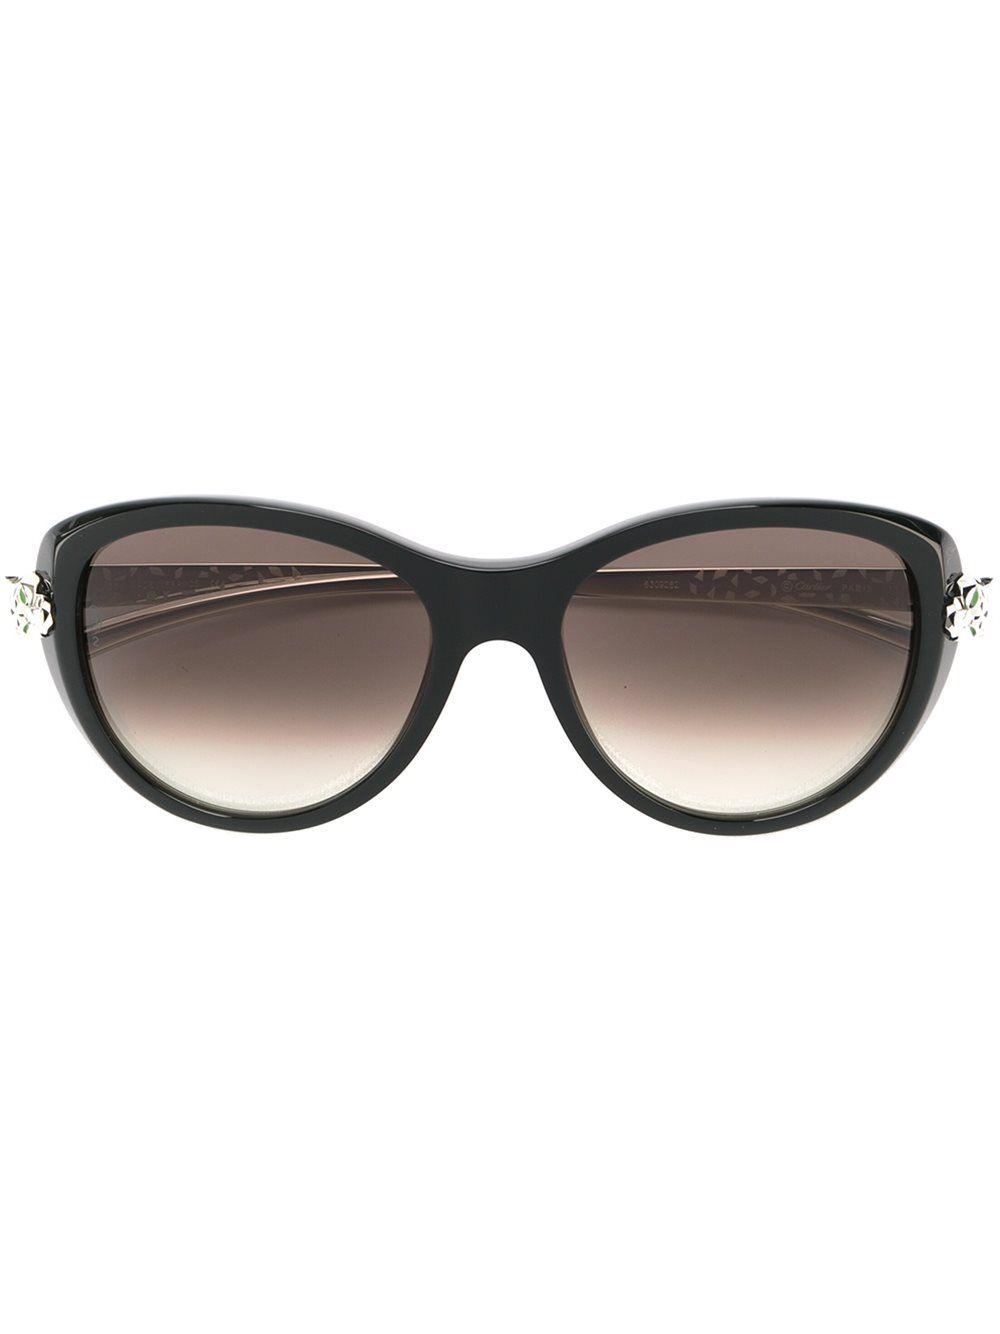 605f14dad Cartier 'Panthère Wild Cat' | glasses | Cat eye sunglasses, Cartier ...